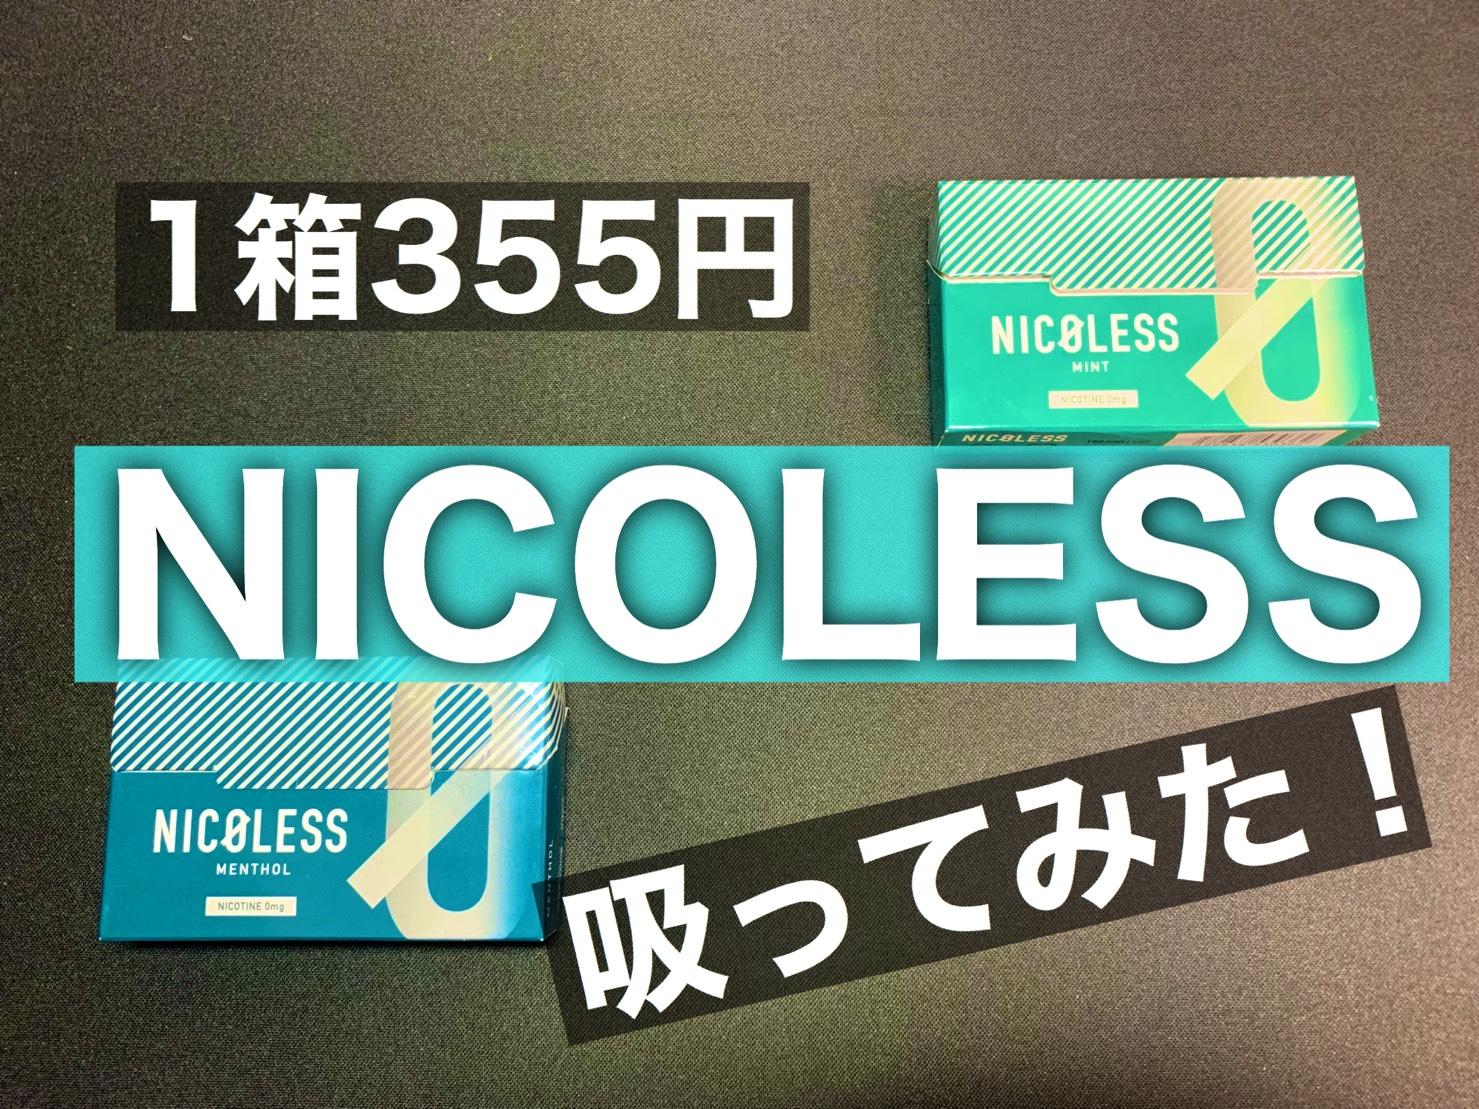 nicoless-review eye catch